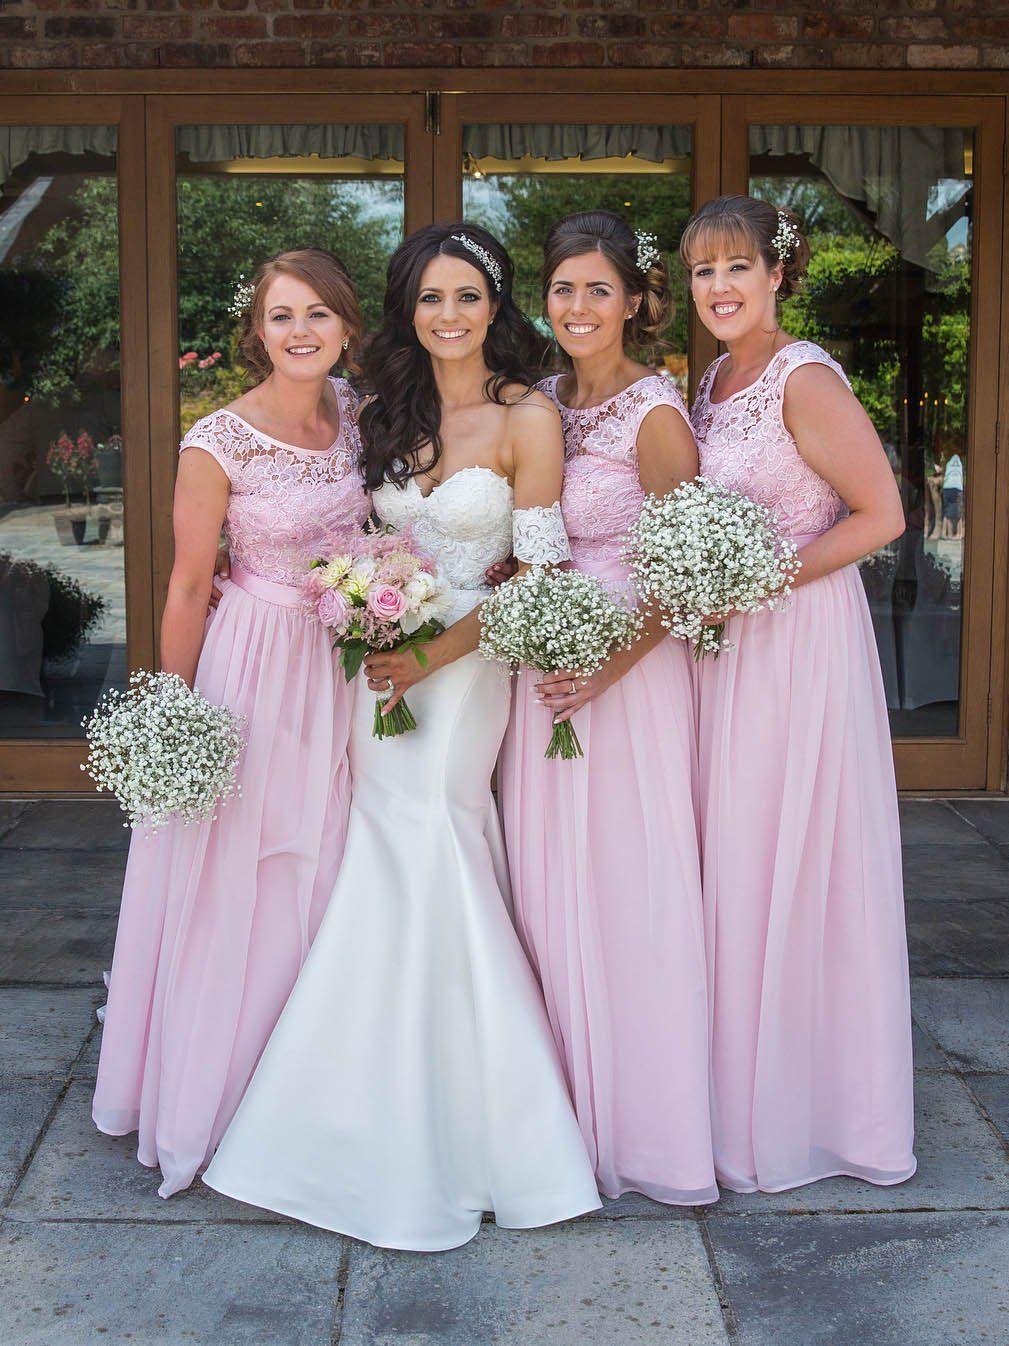 Pink plus size bridesmaid dresses lace top chiffon long bridesmaid